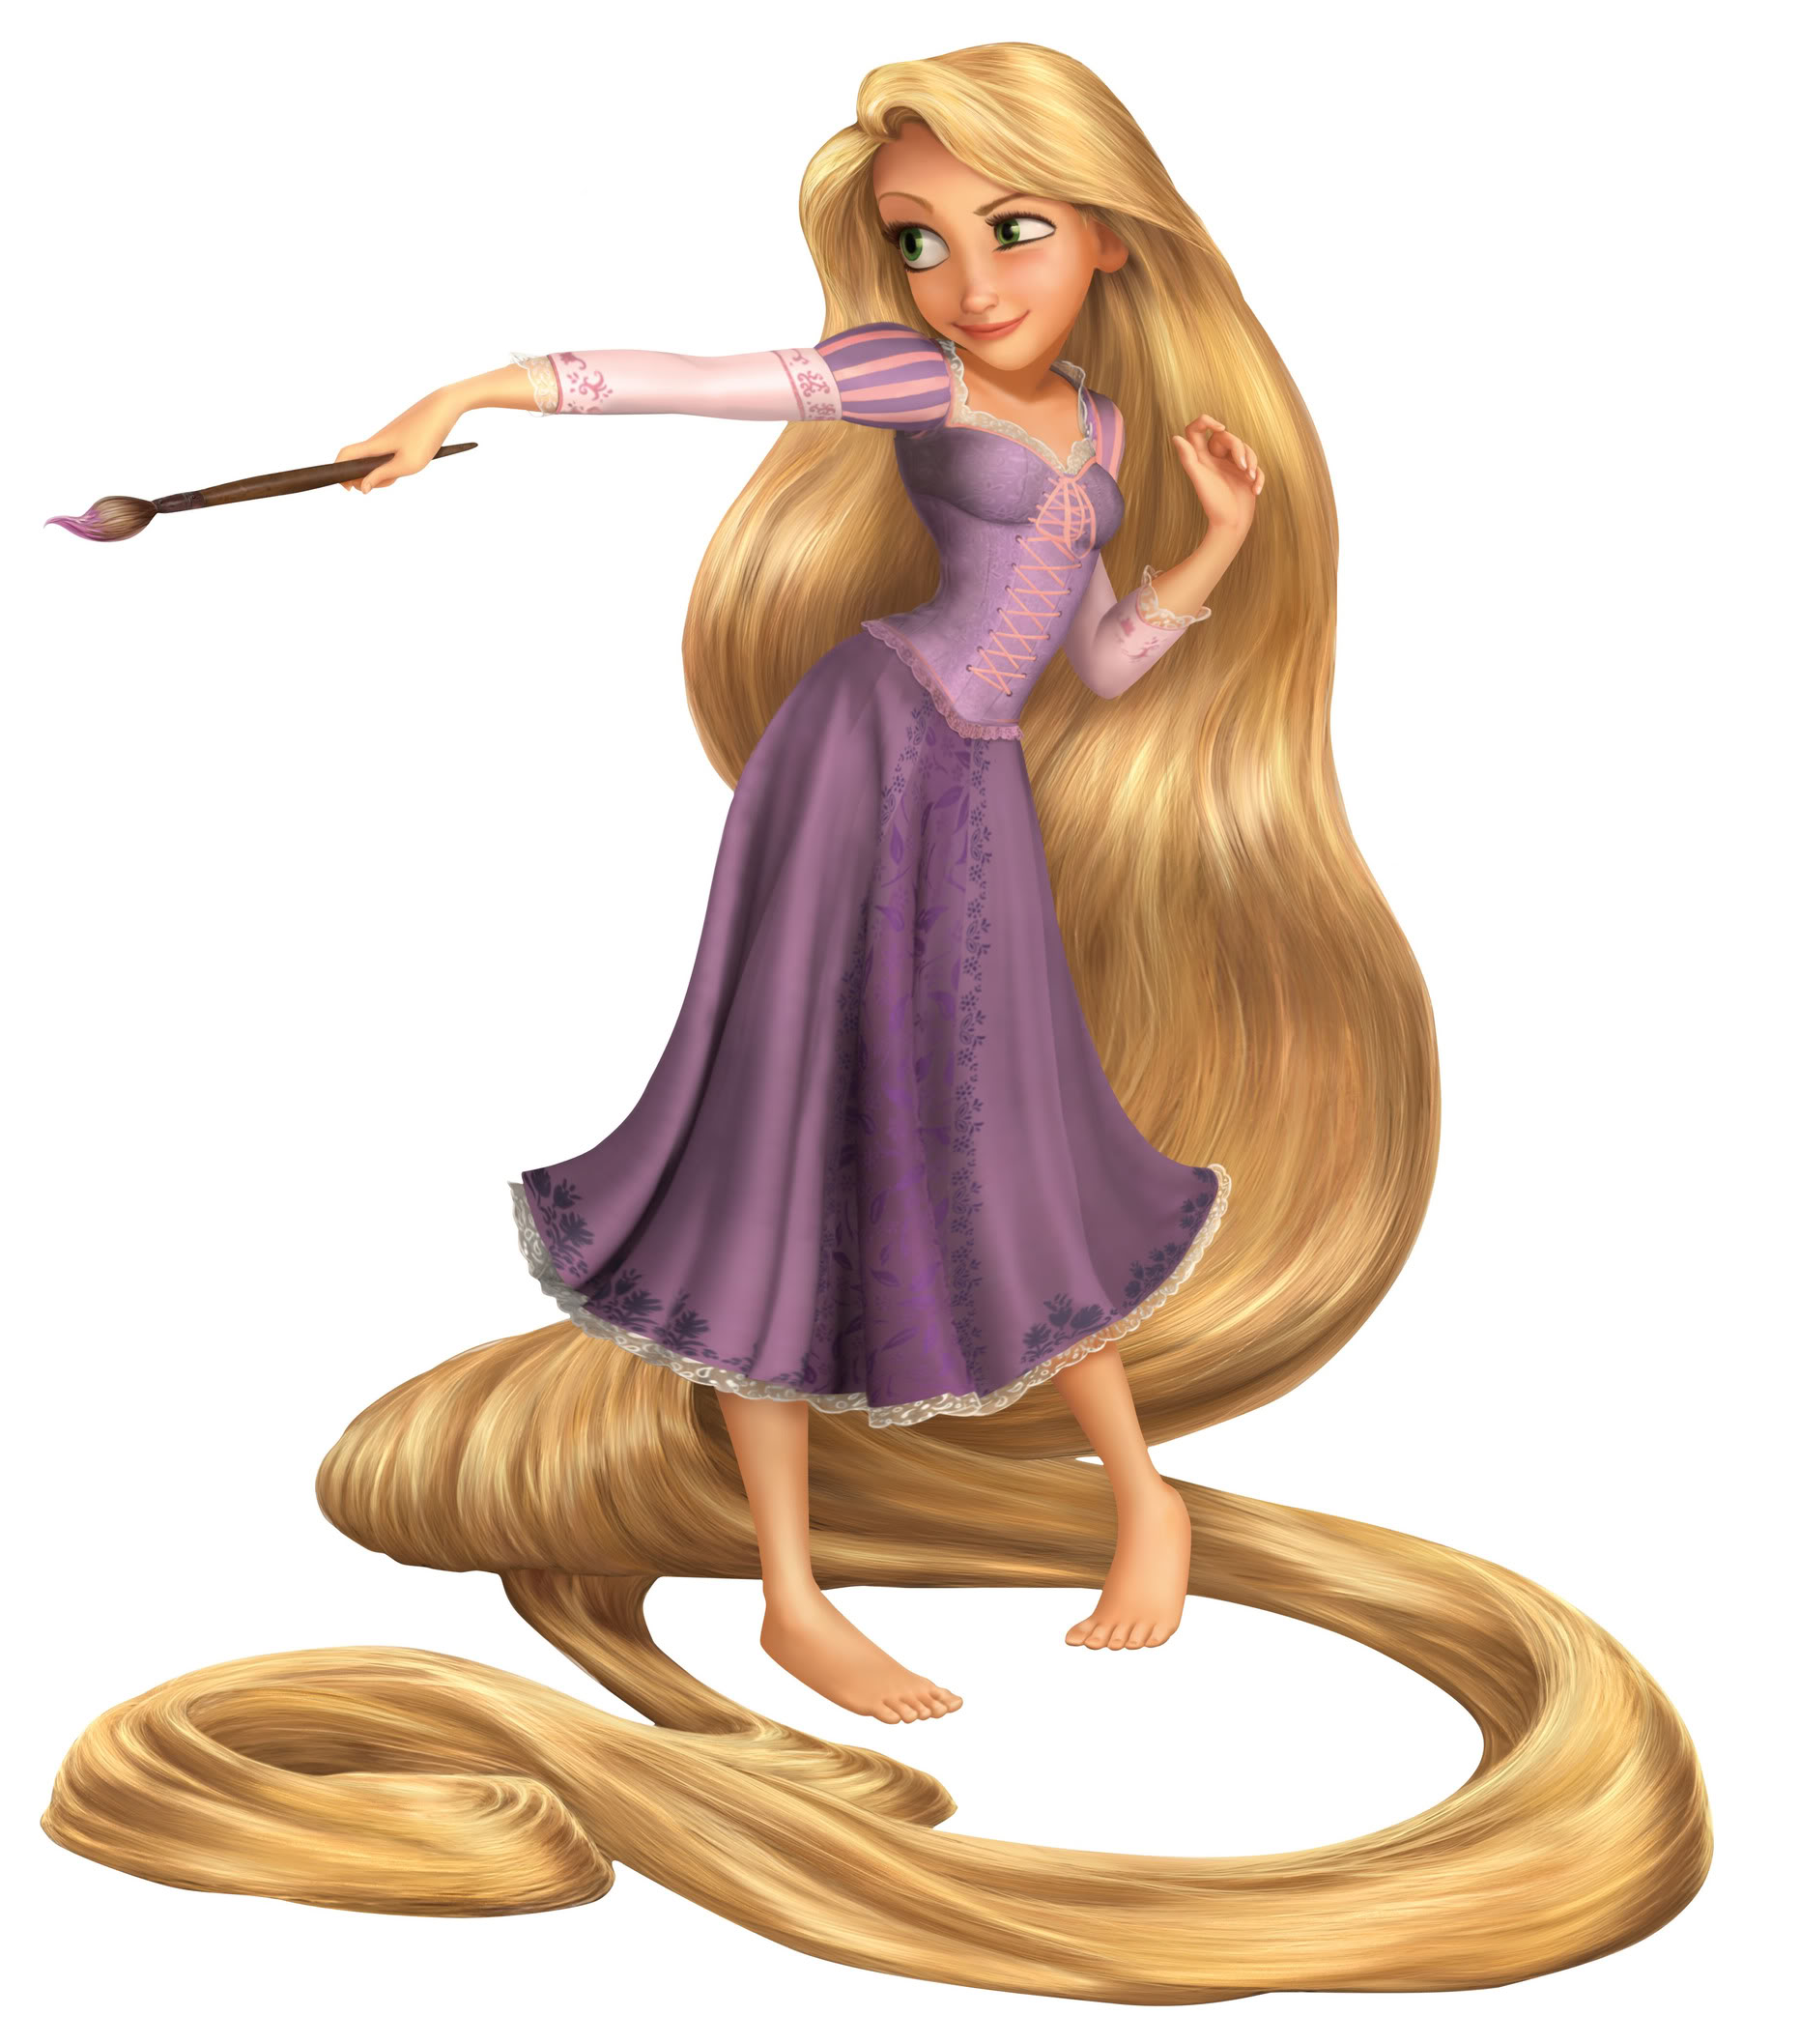 Disney: Rapunzelpainting